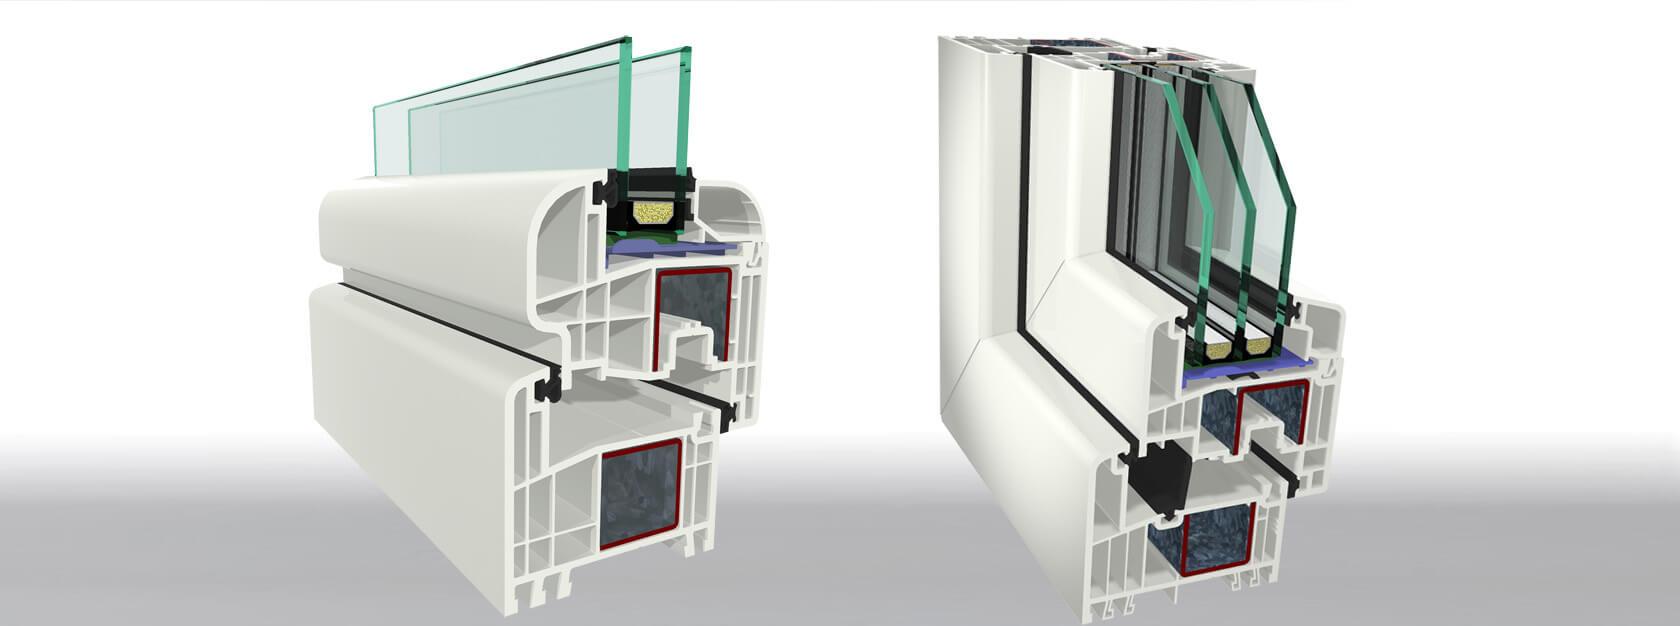 Gealan ablak - Ablakcsere ár, ablakcsere garanciával